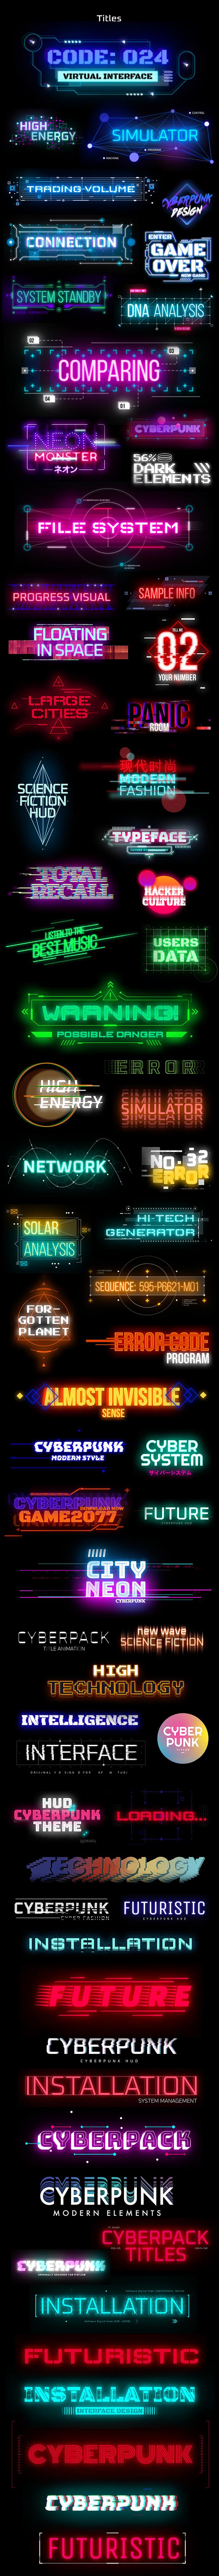 AE脚本-赛博朋克未来科幻霓虹灯发光文本标题背景动态工具包 Cyberpunk Titles Lowerthirds and Backgrounds插图2